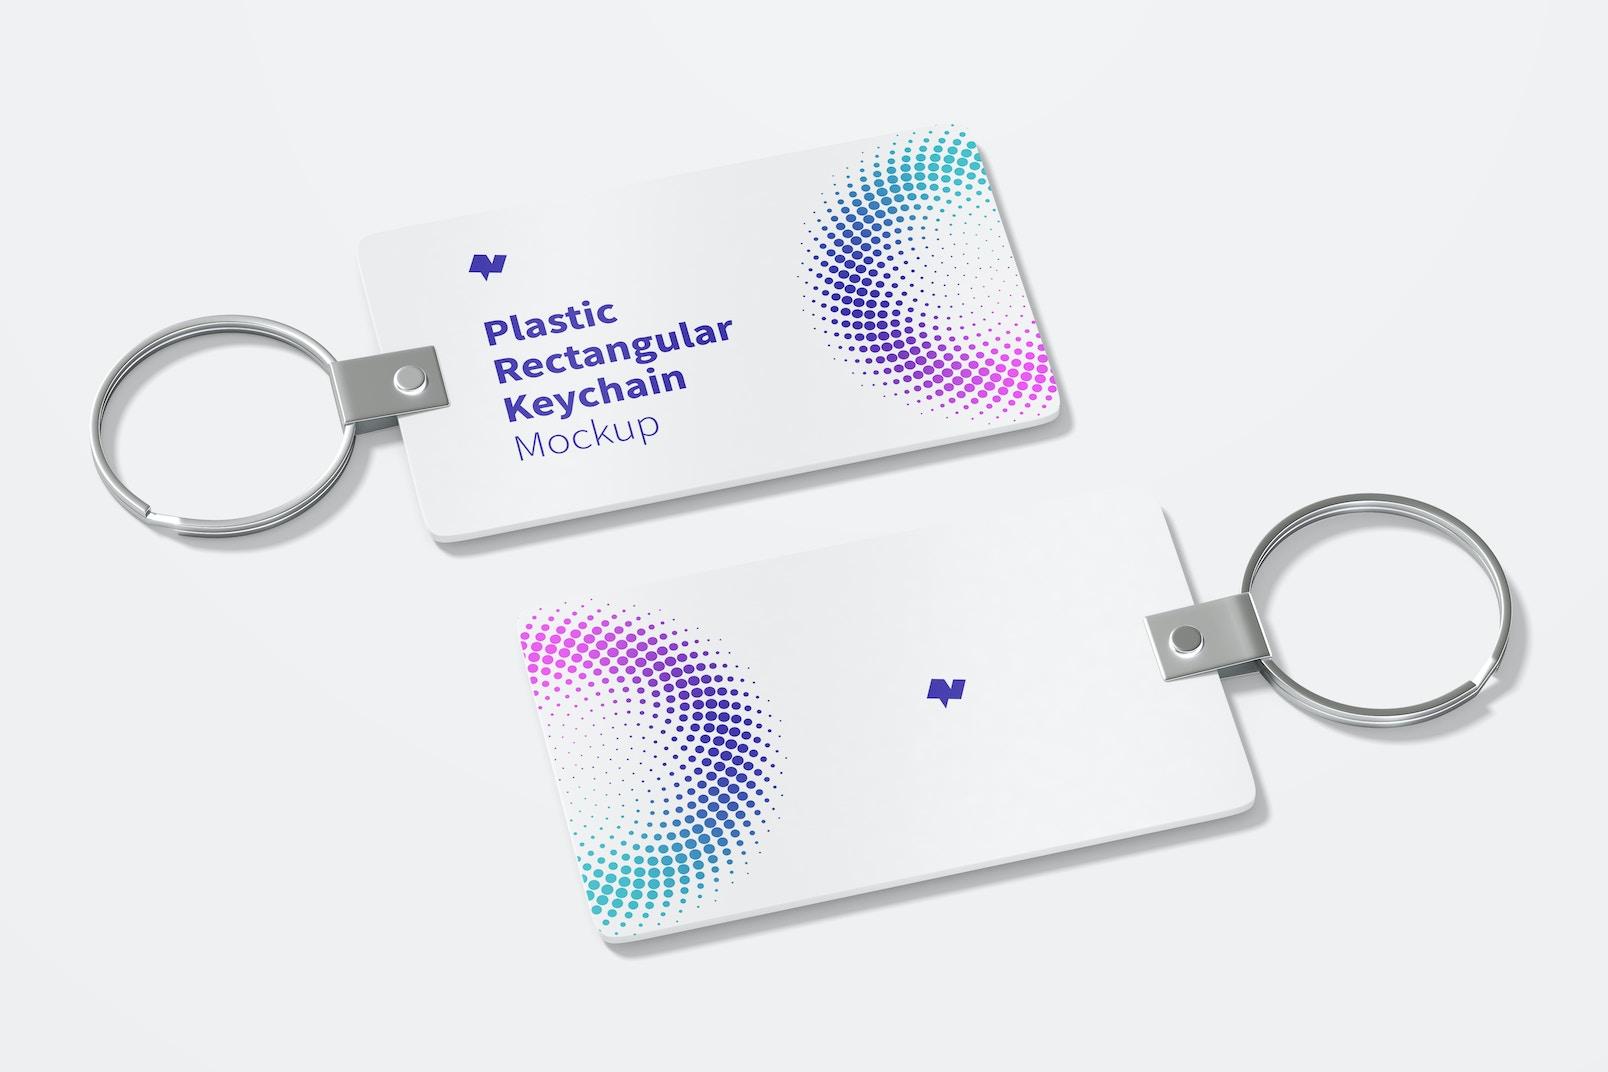 Plastic Rectangular Keychains Mockup, Right View